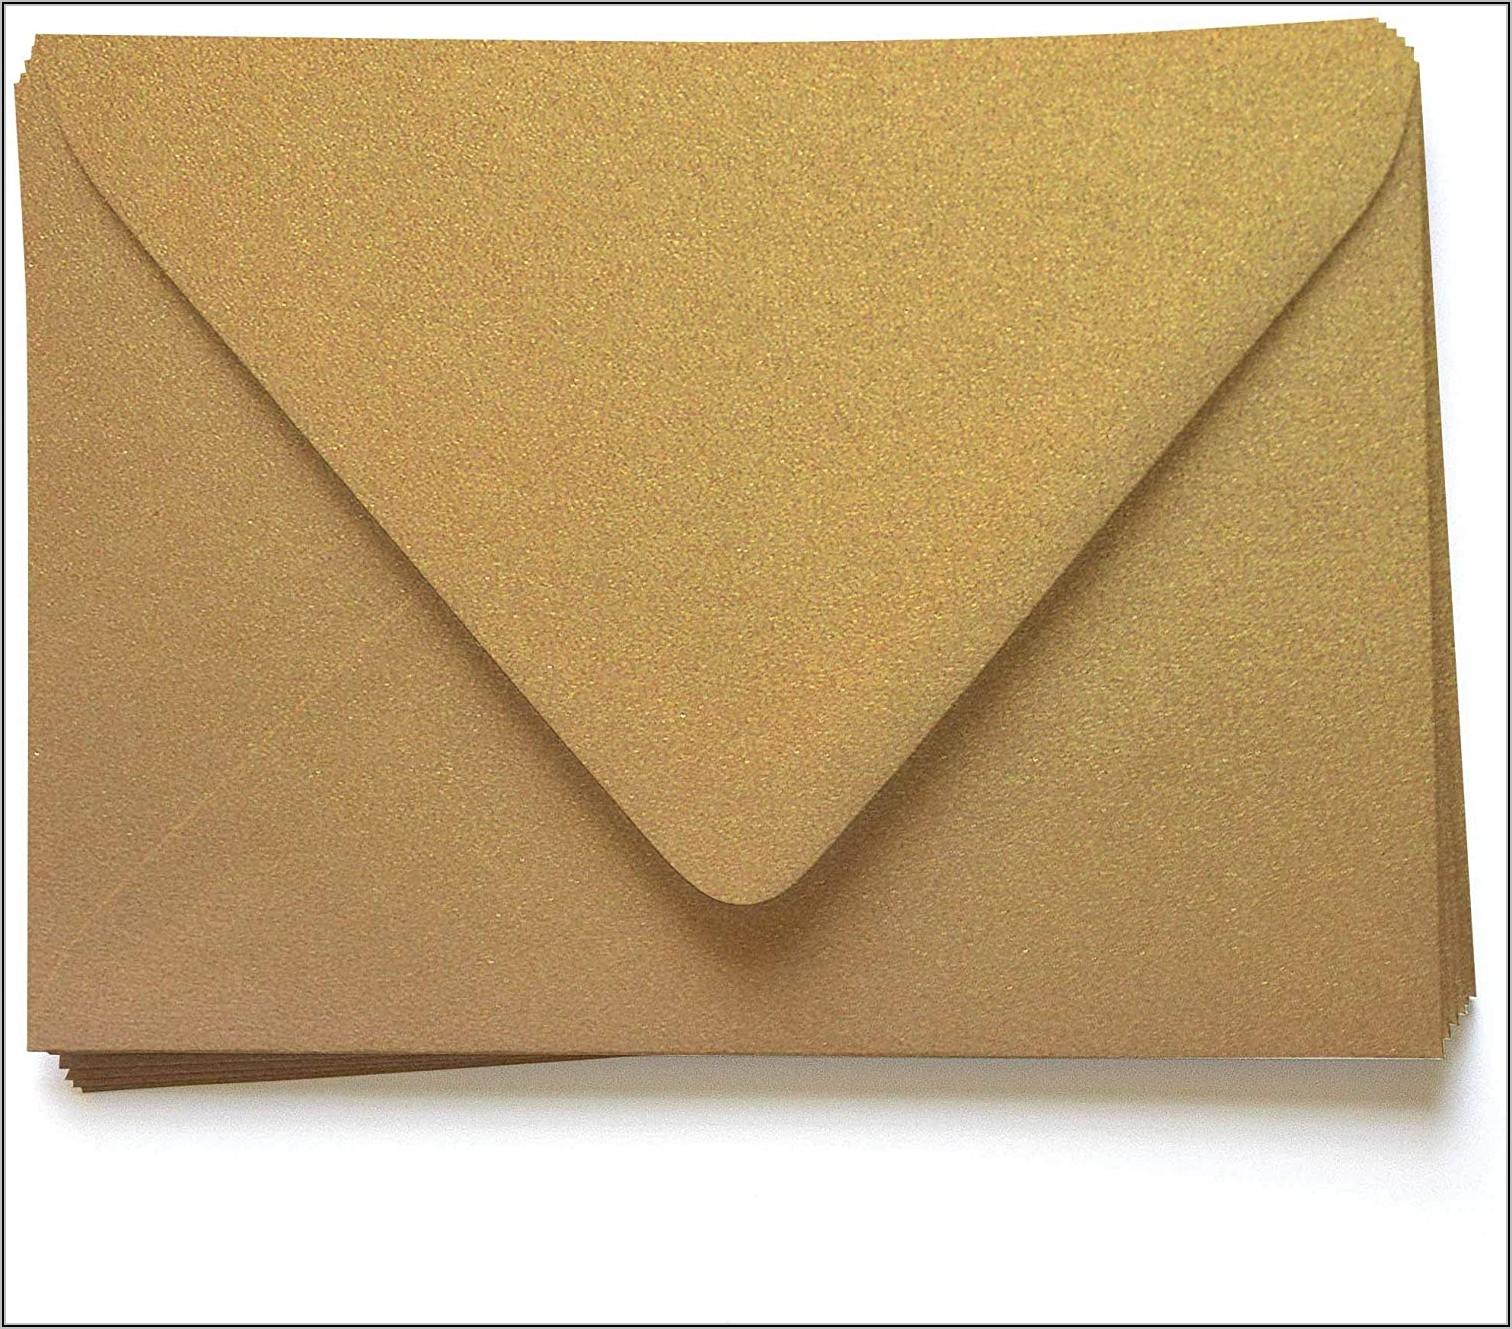 Gold Metallic A7 Envelopes